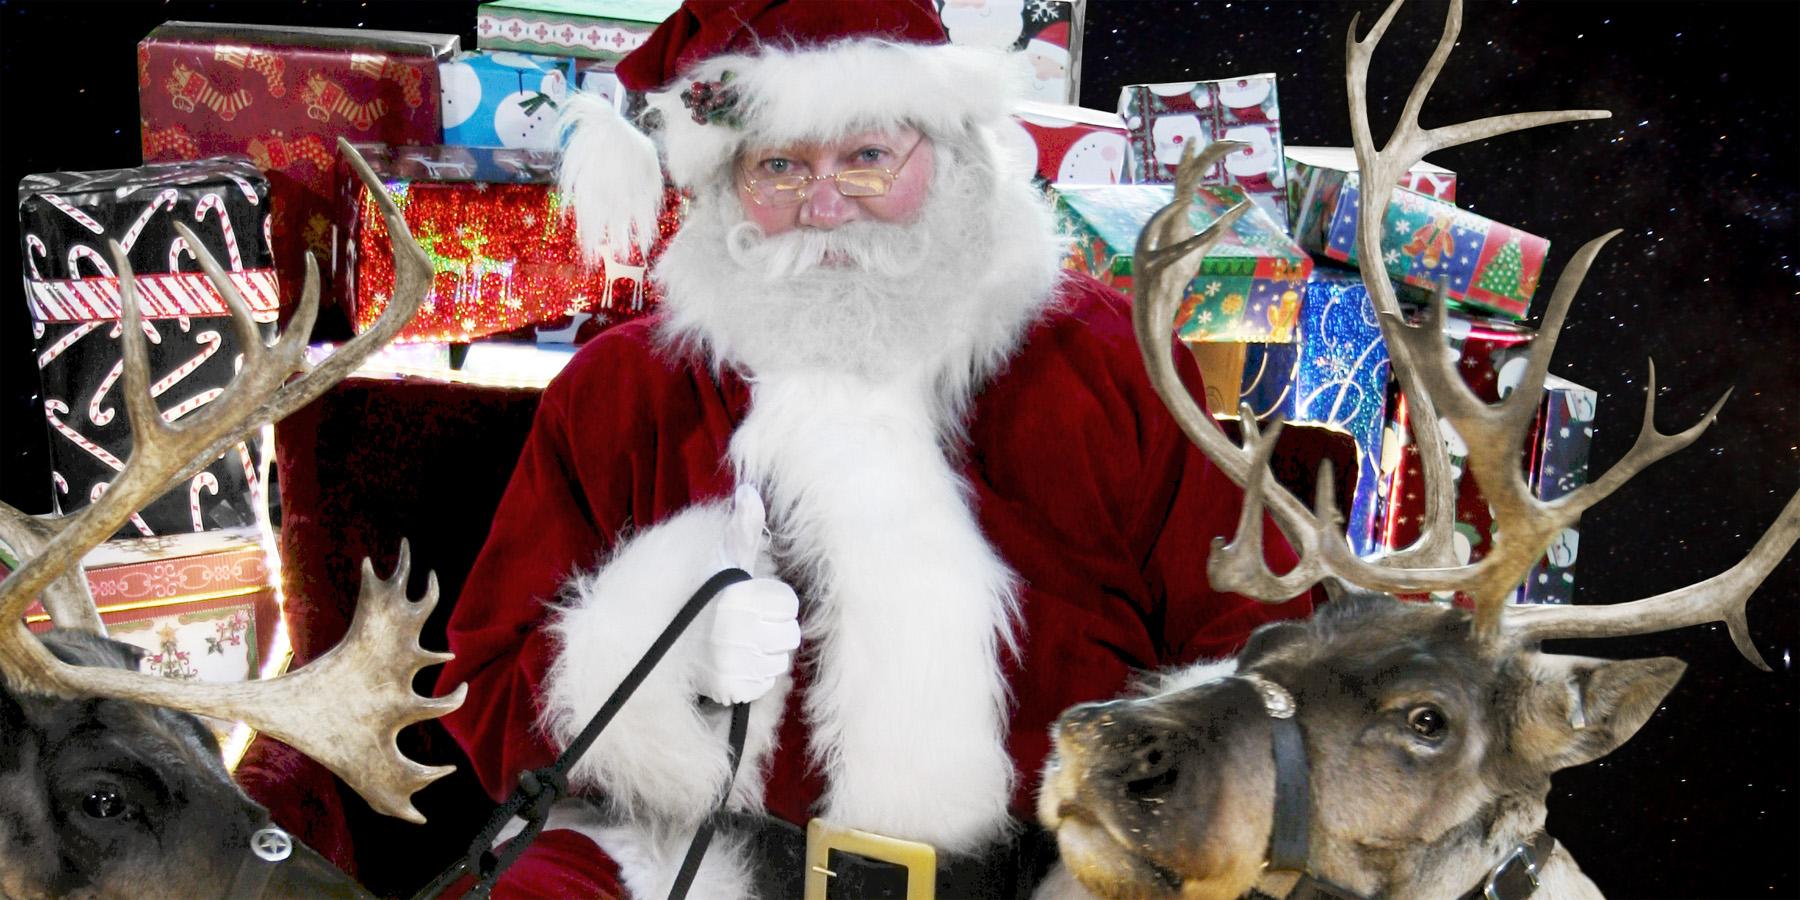 Kids Use Santa Snooper Sleigh-cam To Spy On Christmas Eve Flight